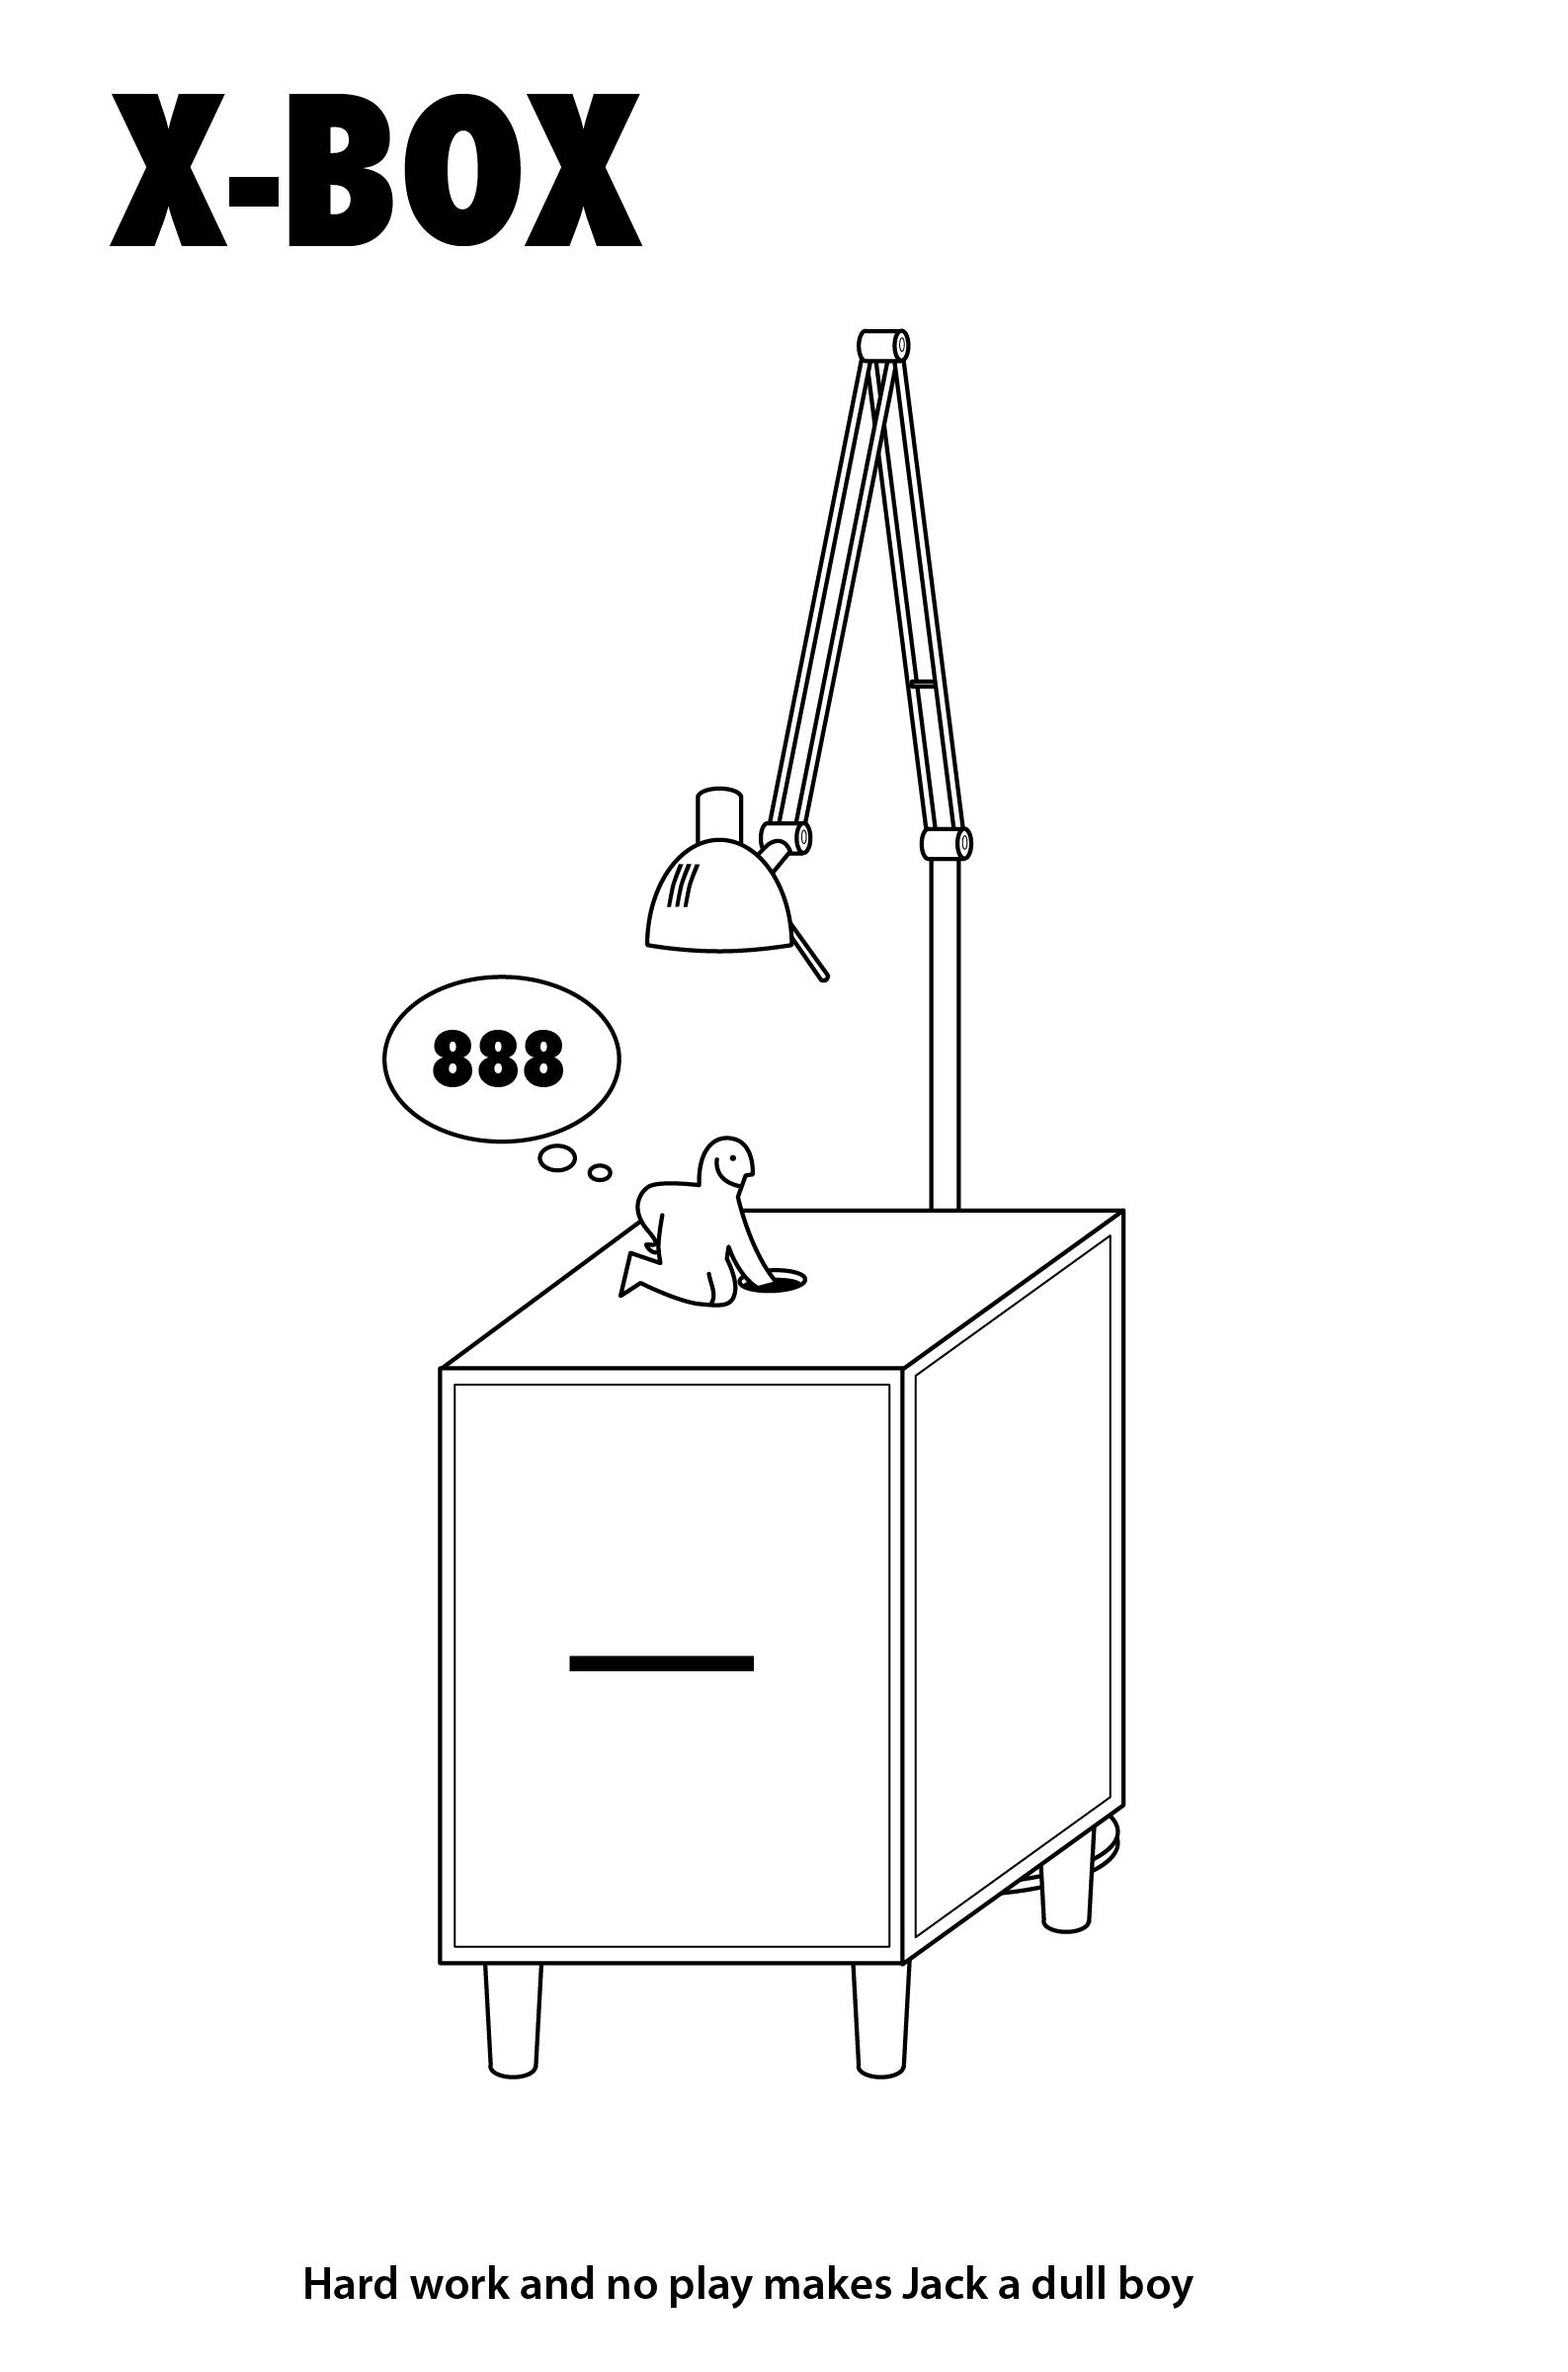 x-box_new-01.jpg